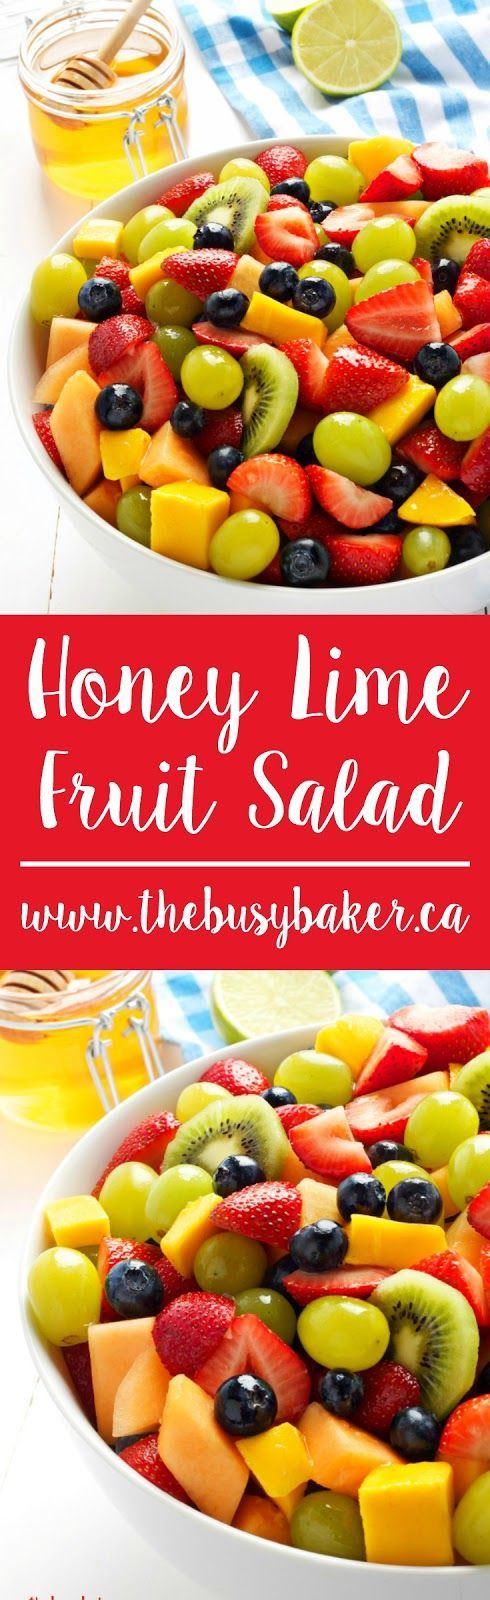 Honey Lime Fruit Salad www.thebusybaker.ca